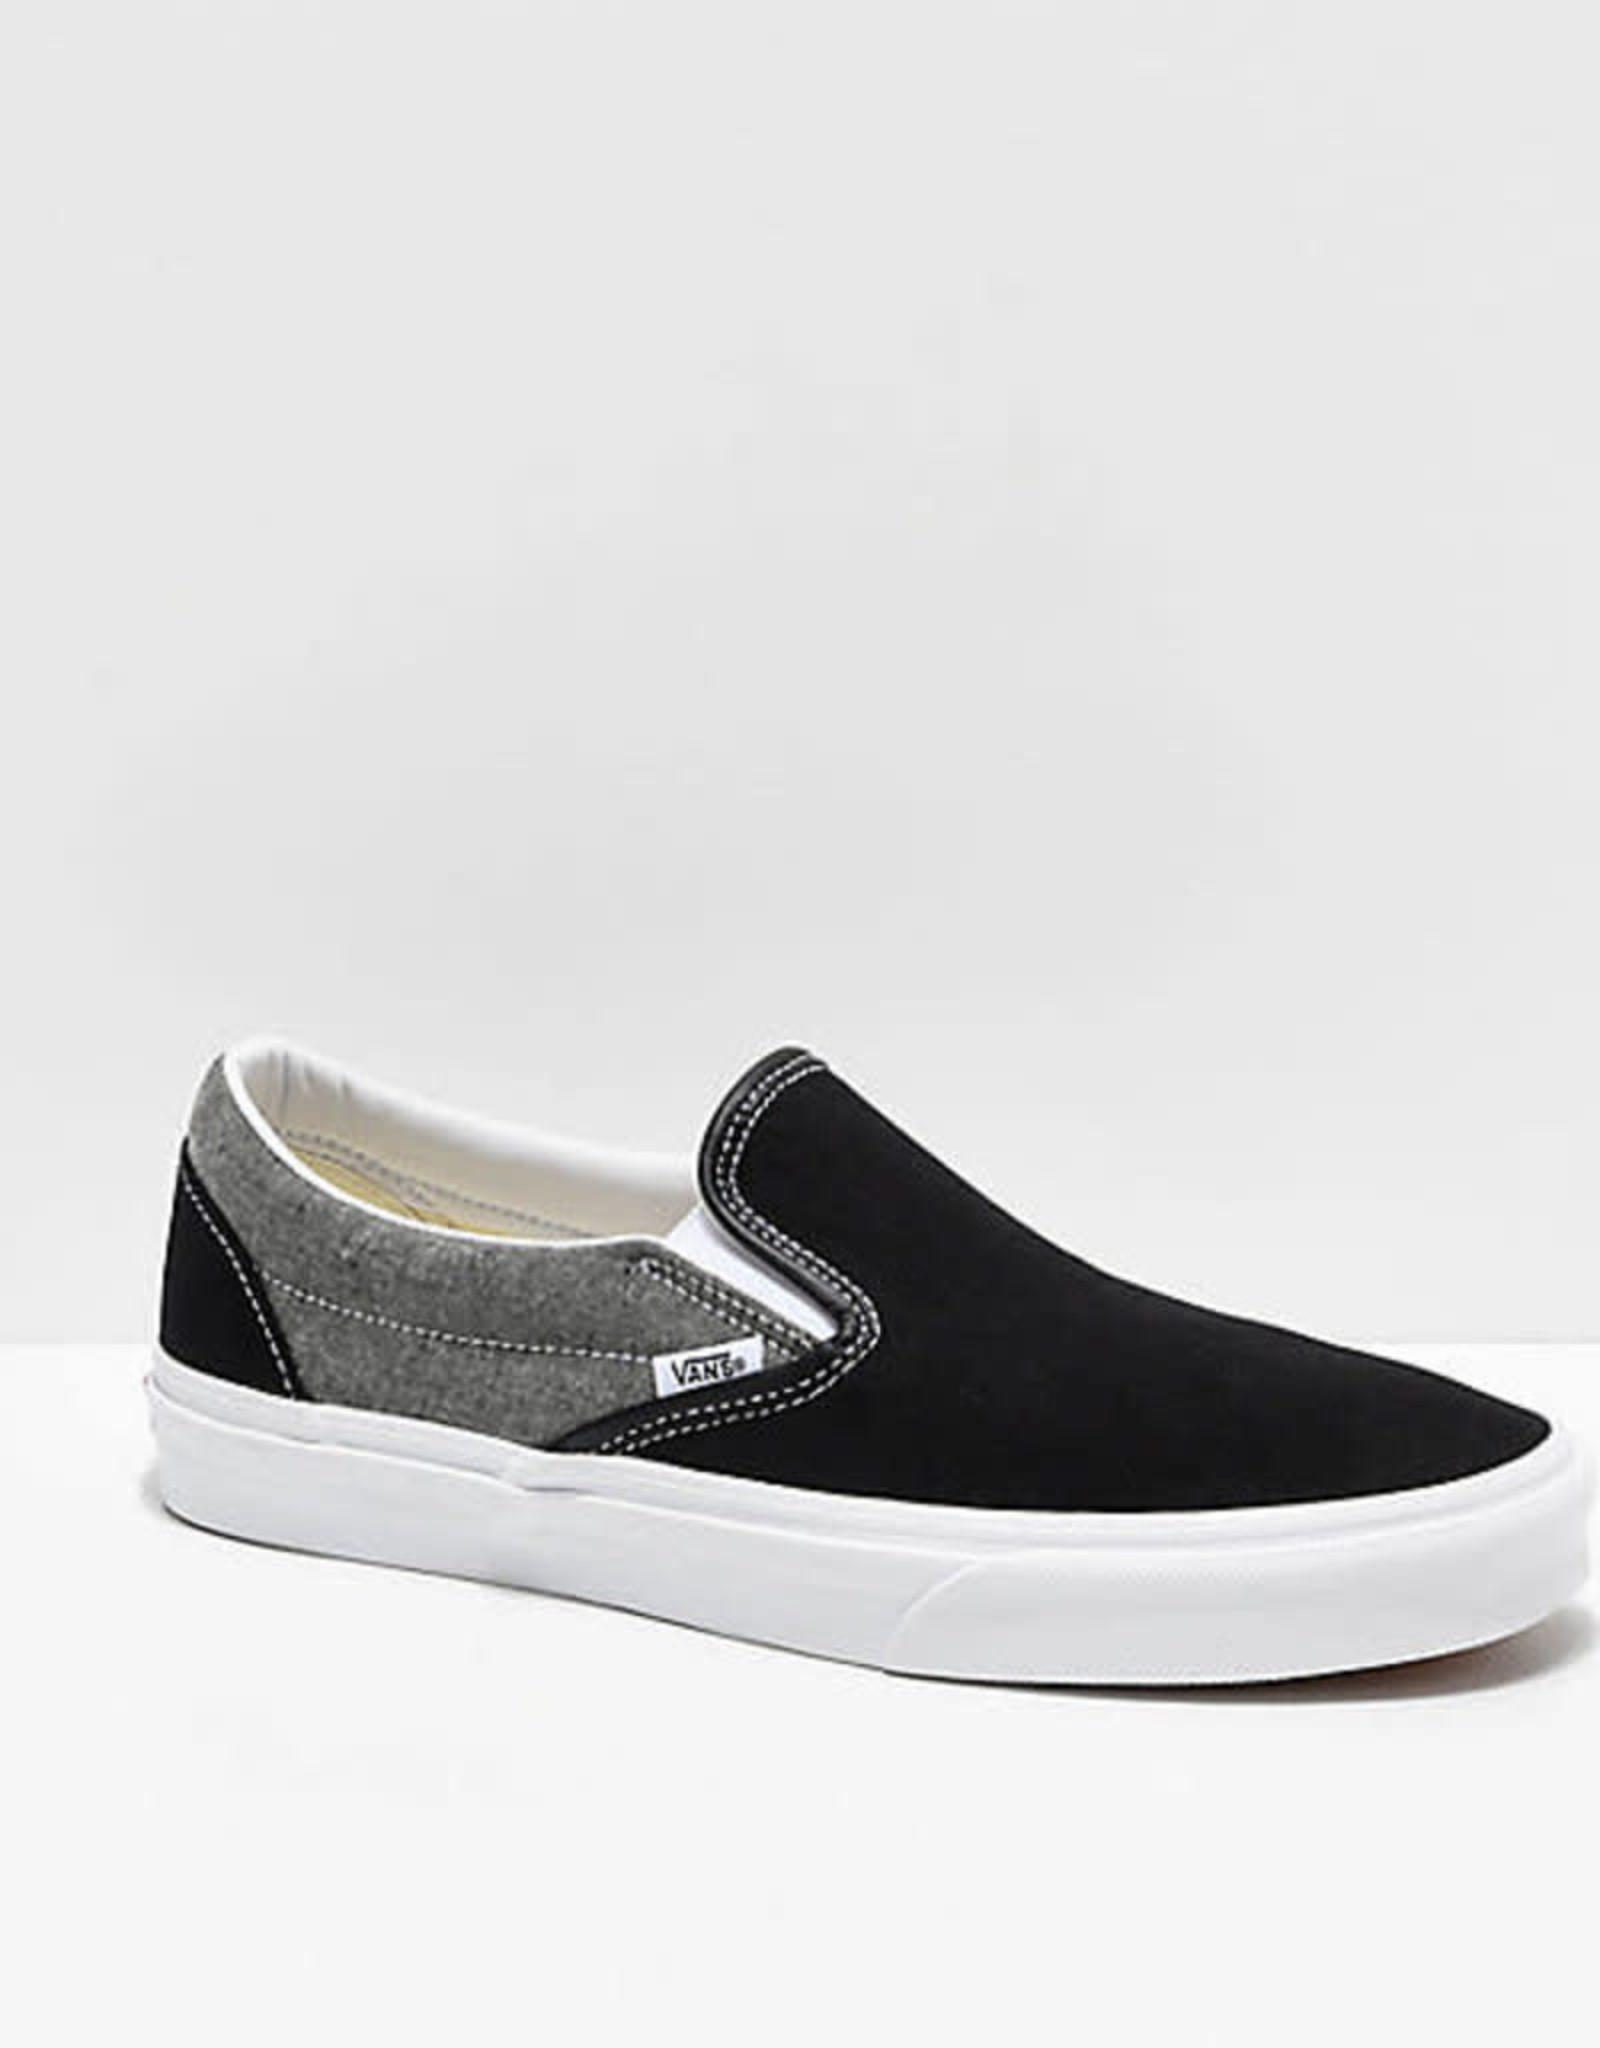 Vans VANS Classic Slip-On (Chambray) Canvas Black/Grey